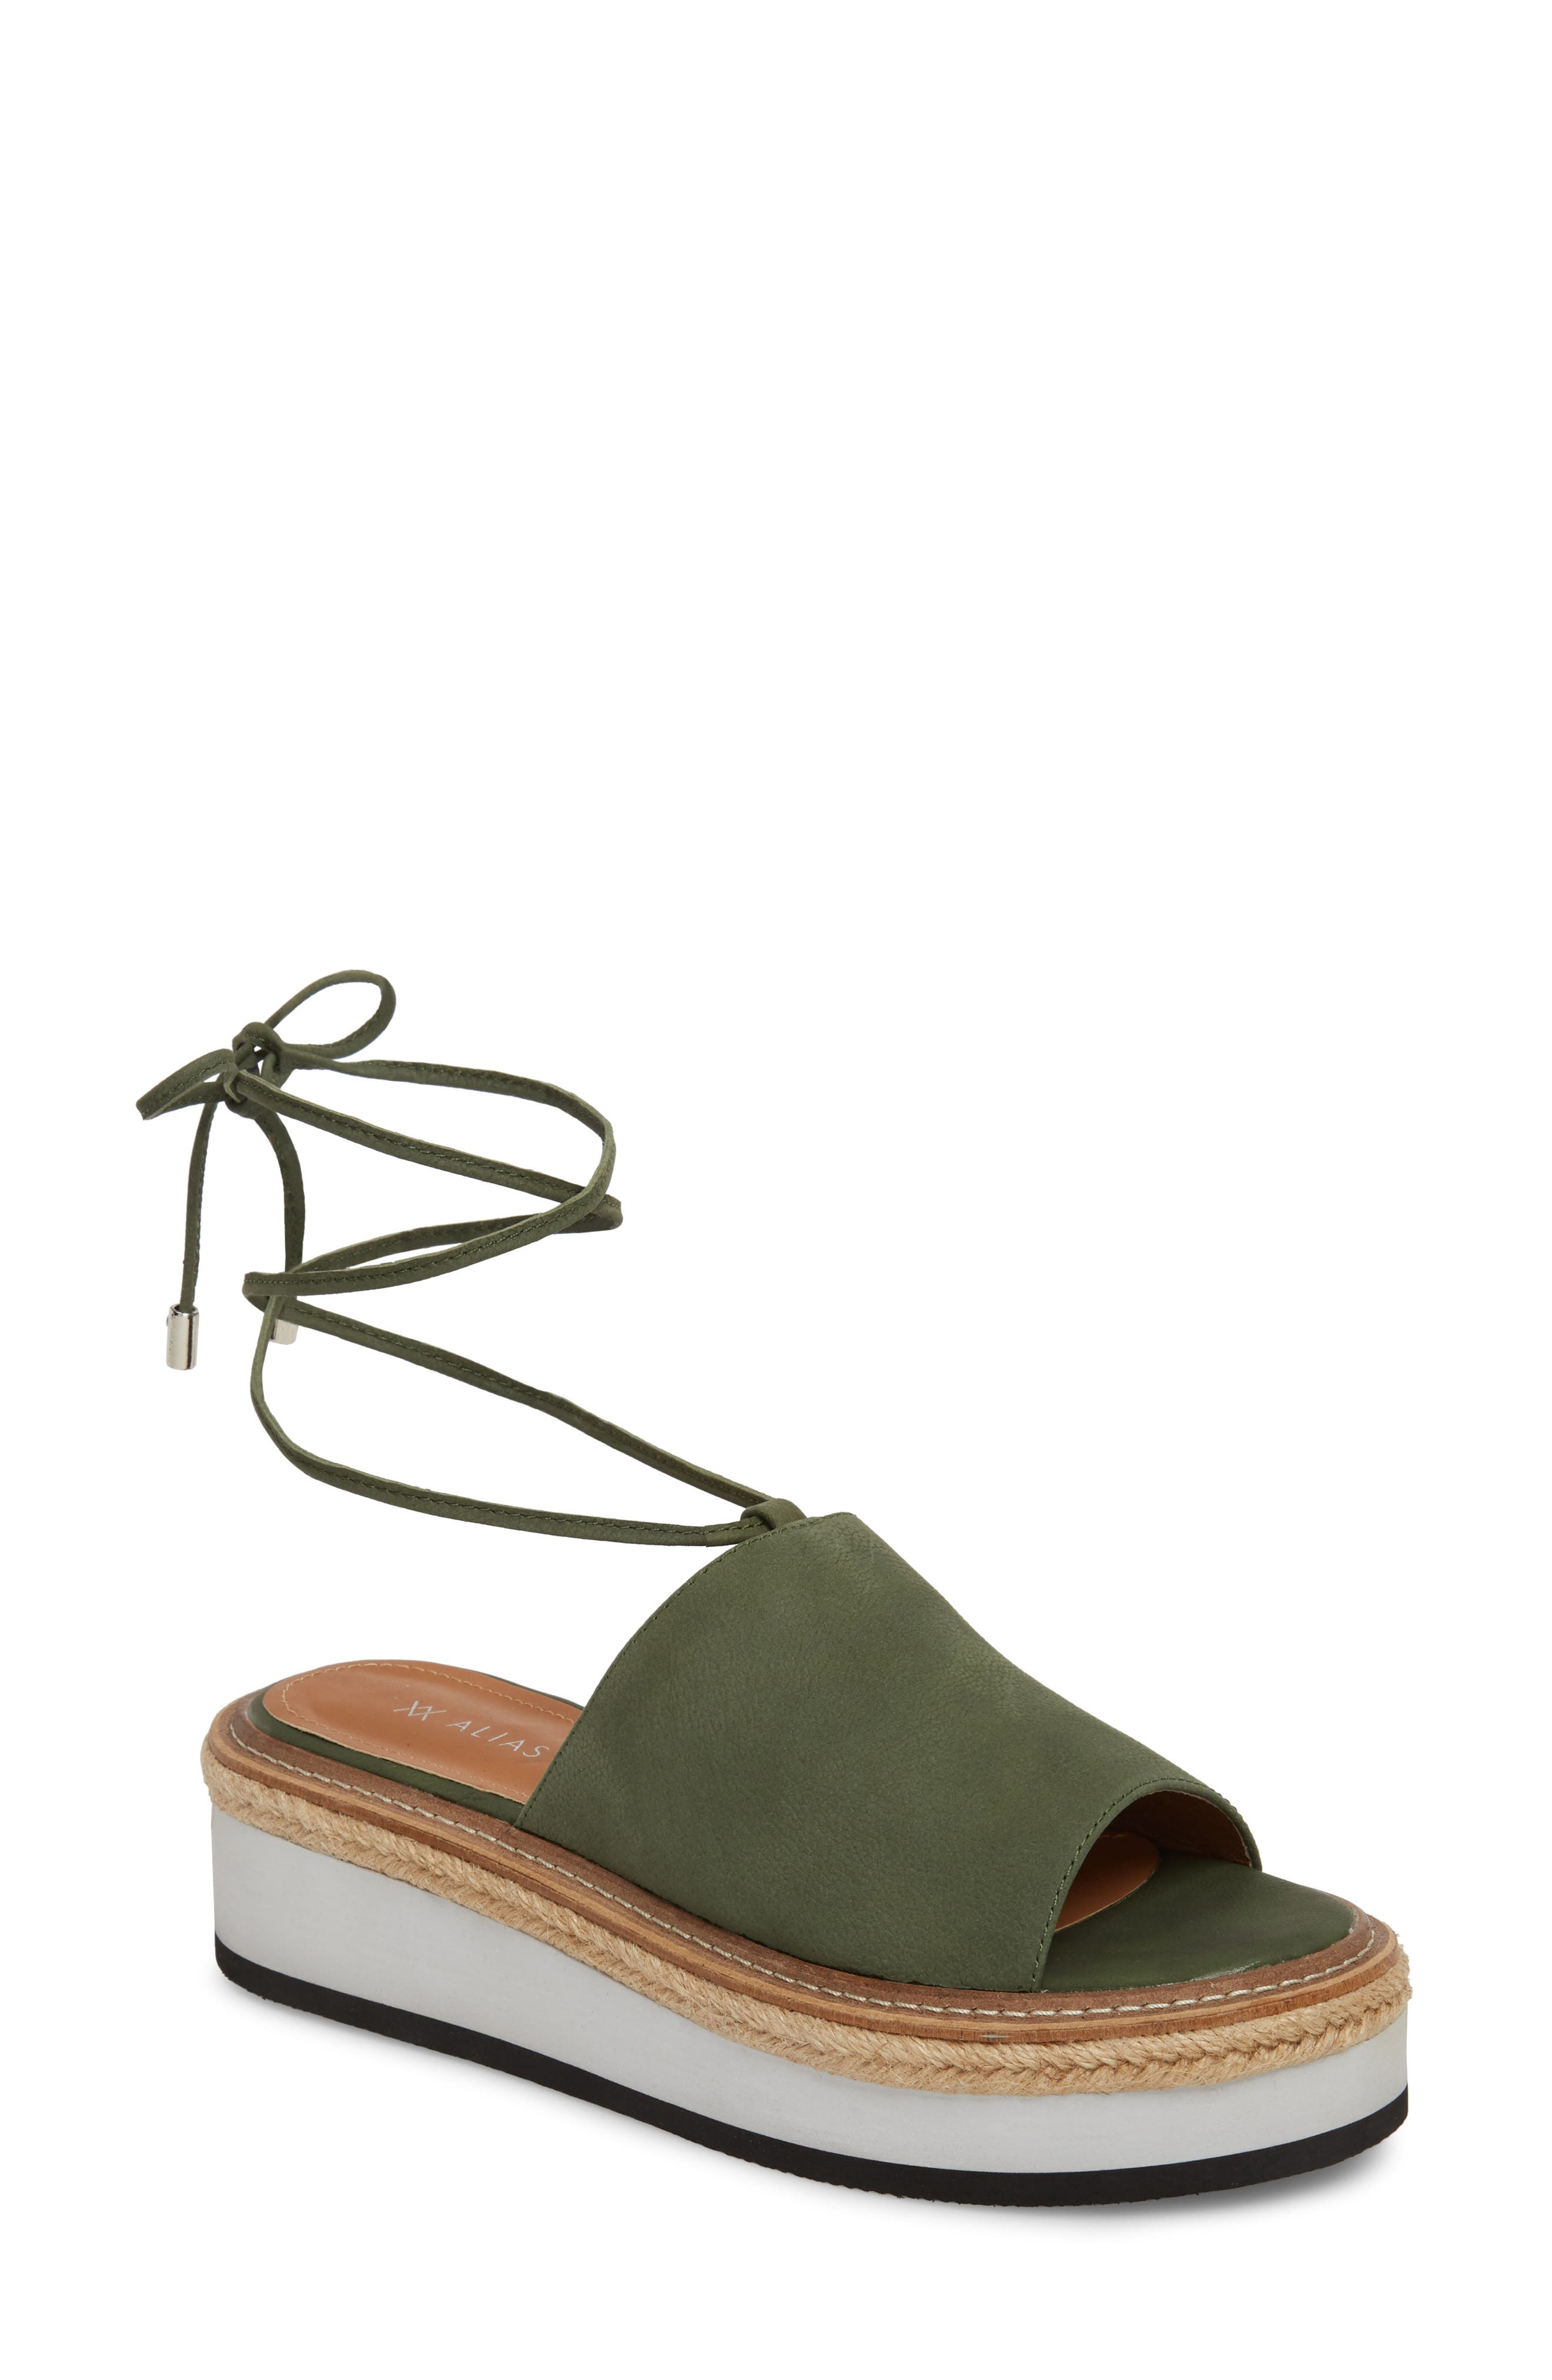 Nickel Platform Sandal,                             Main thumbnail 1, color,                             Khaki Nubuck Leather